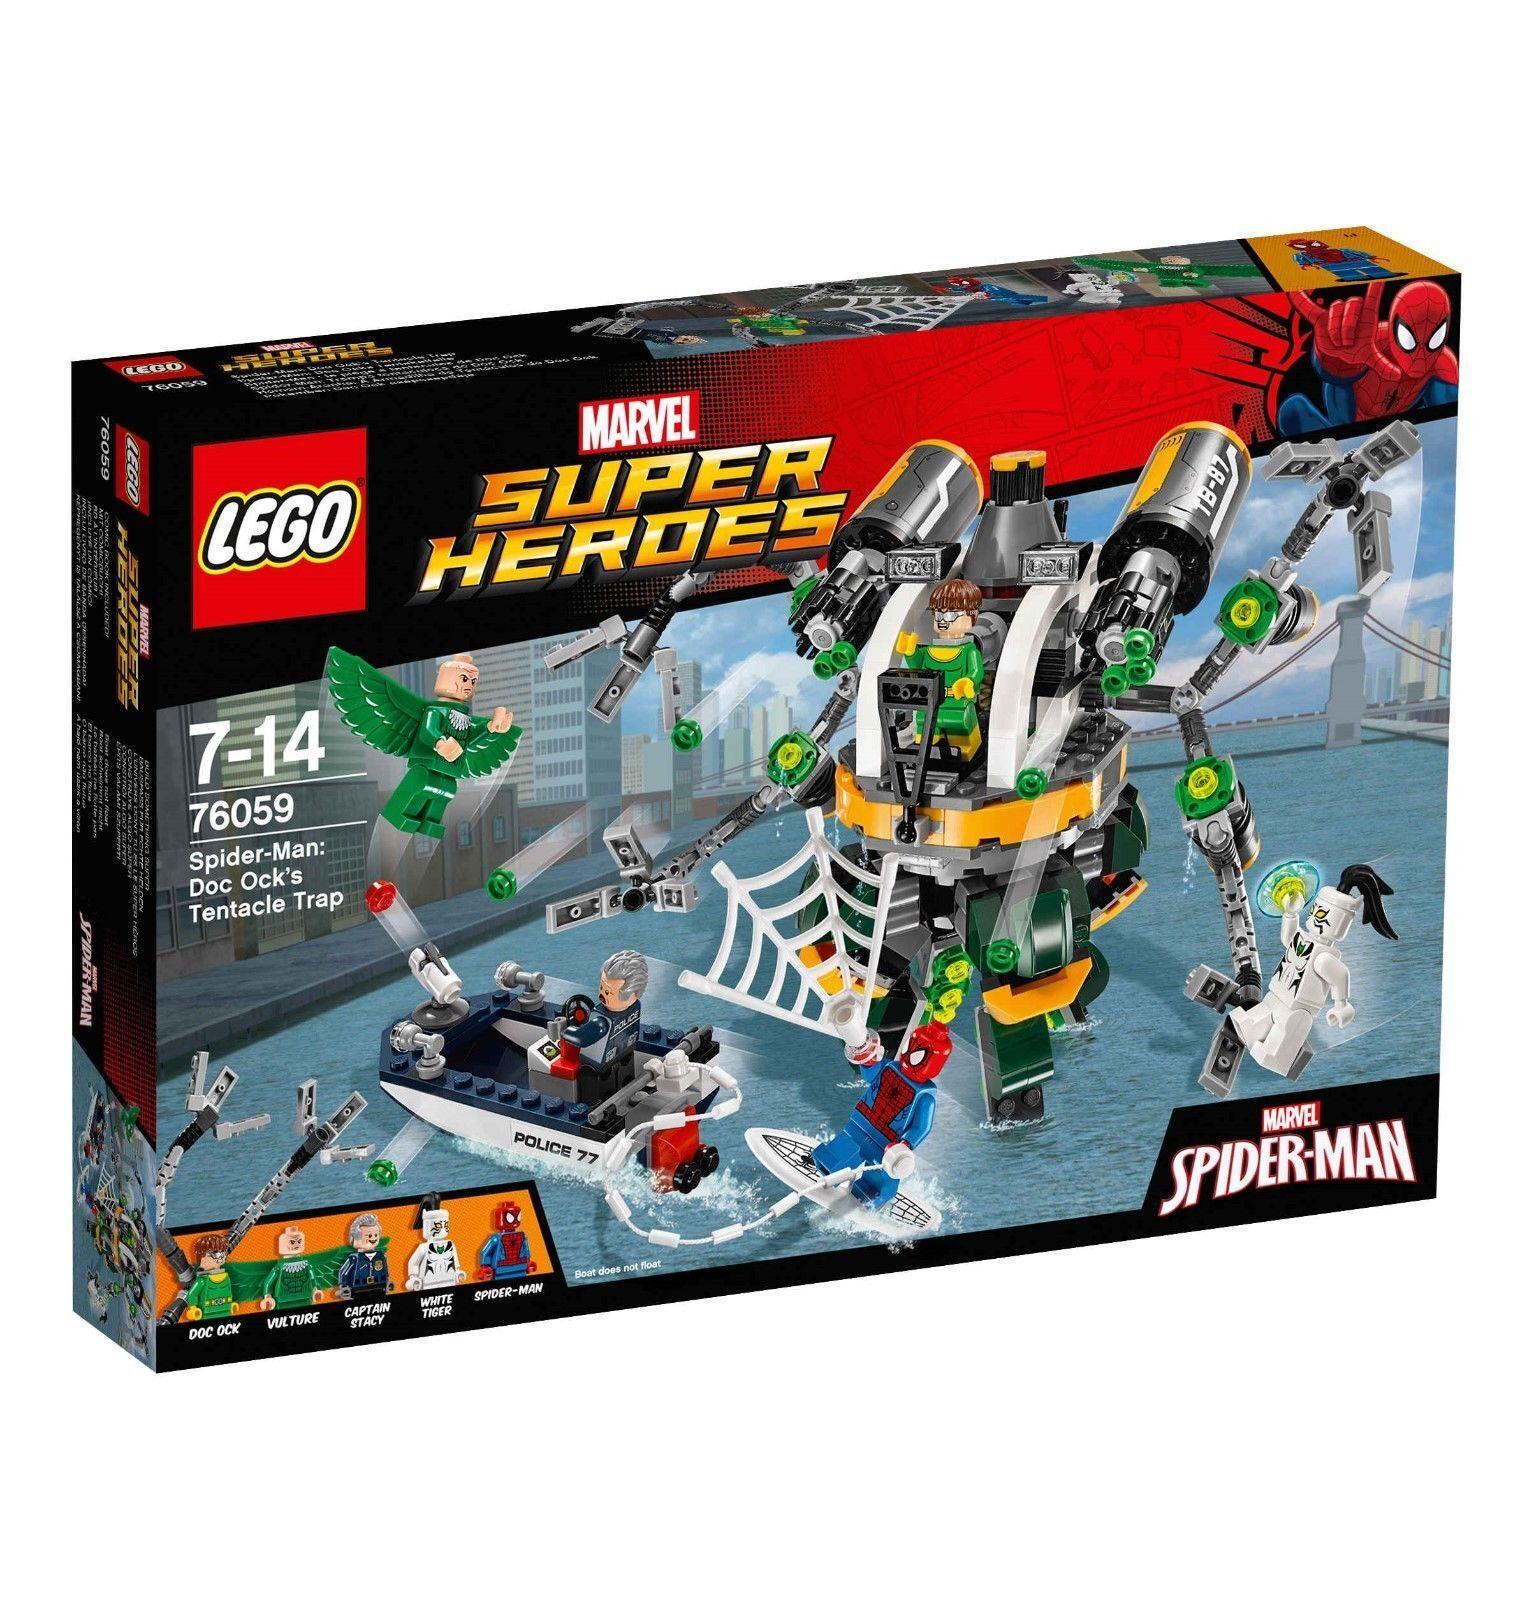 LEGO ® MARVEL SUPER HEROES 76059  Spider-Man  DOC ocks tentacoli caso  Nuovo Scatola Originale